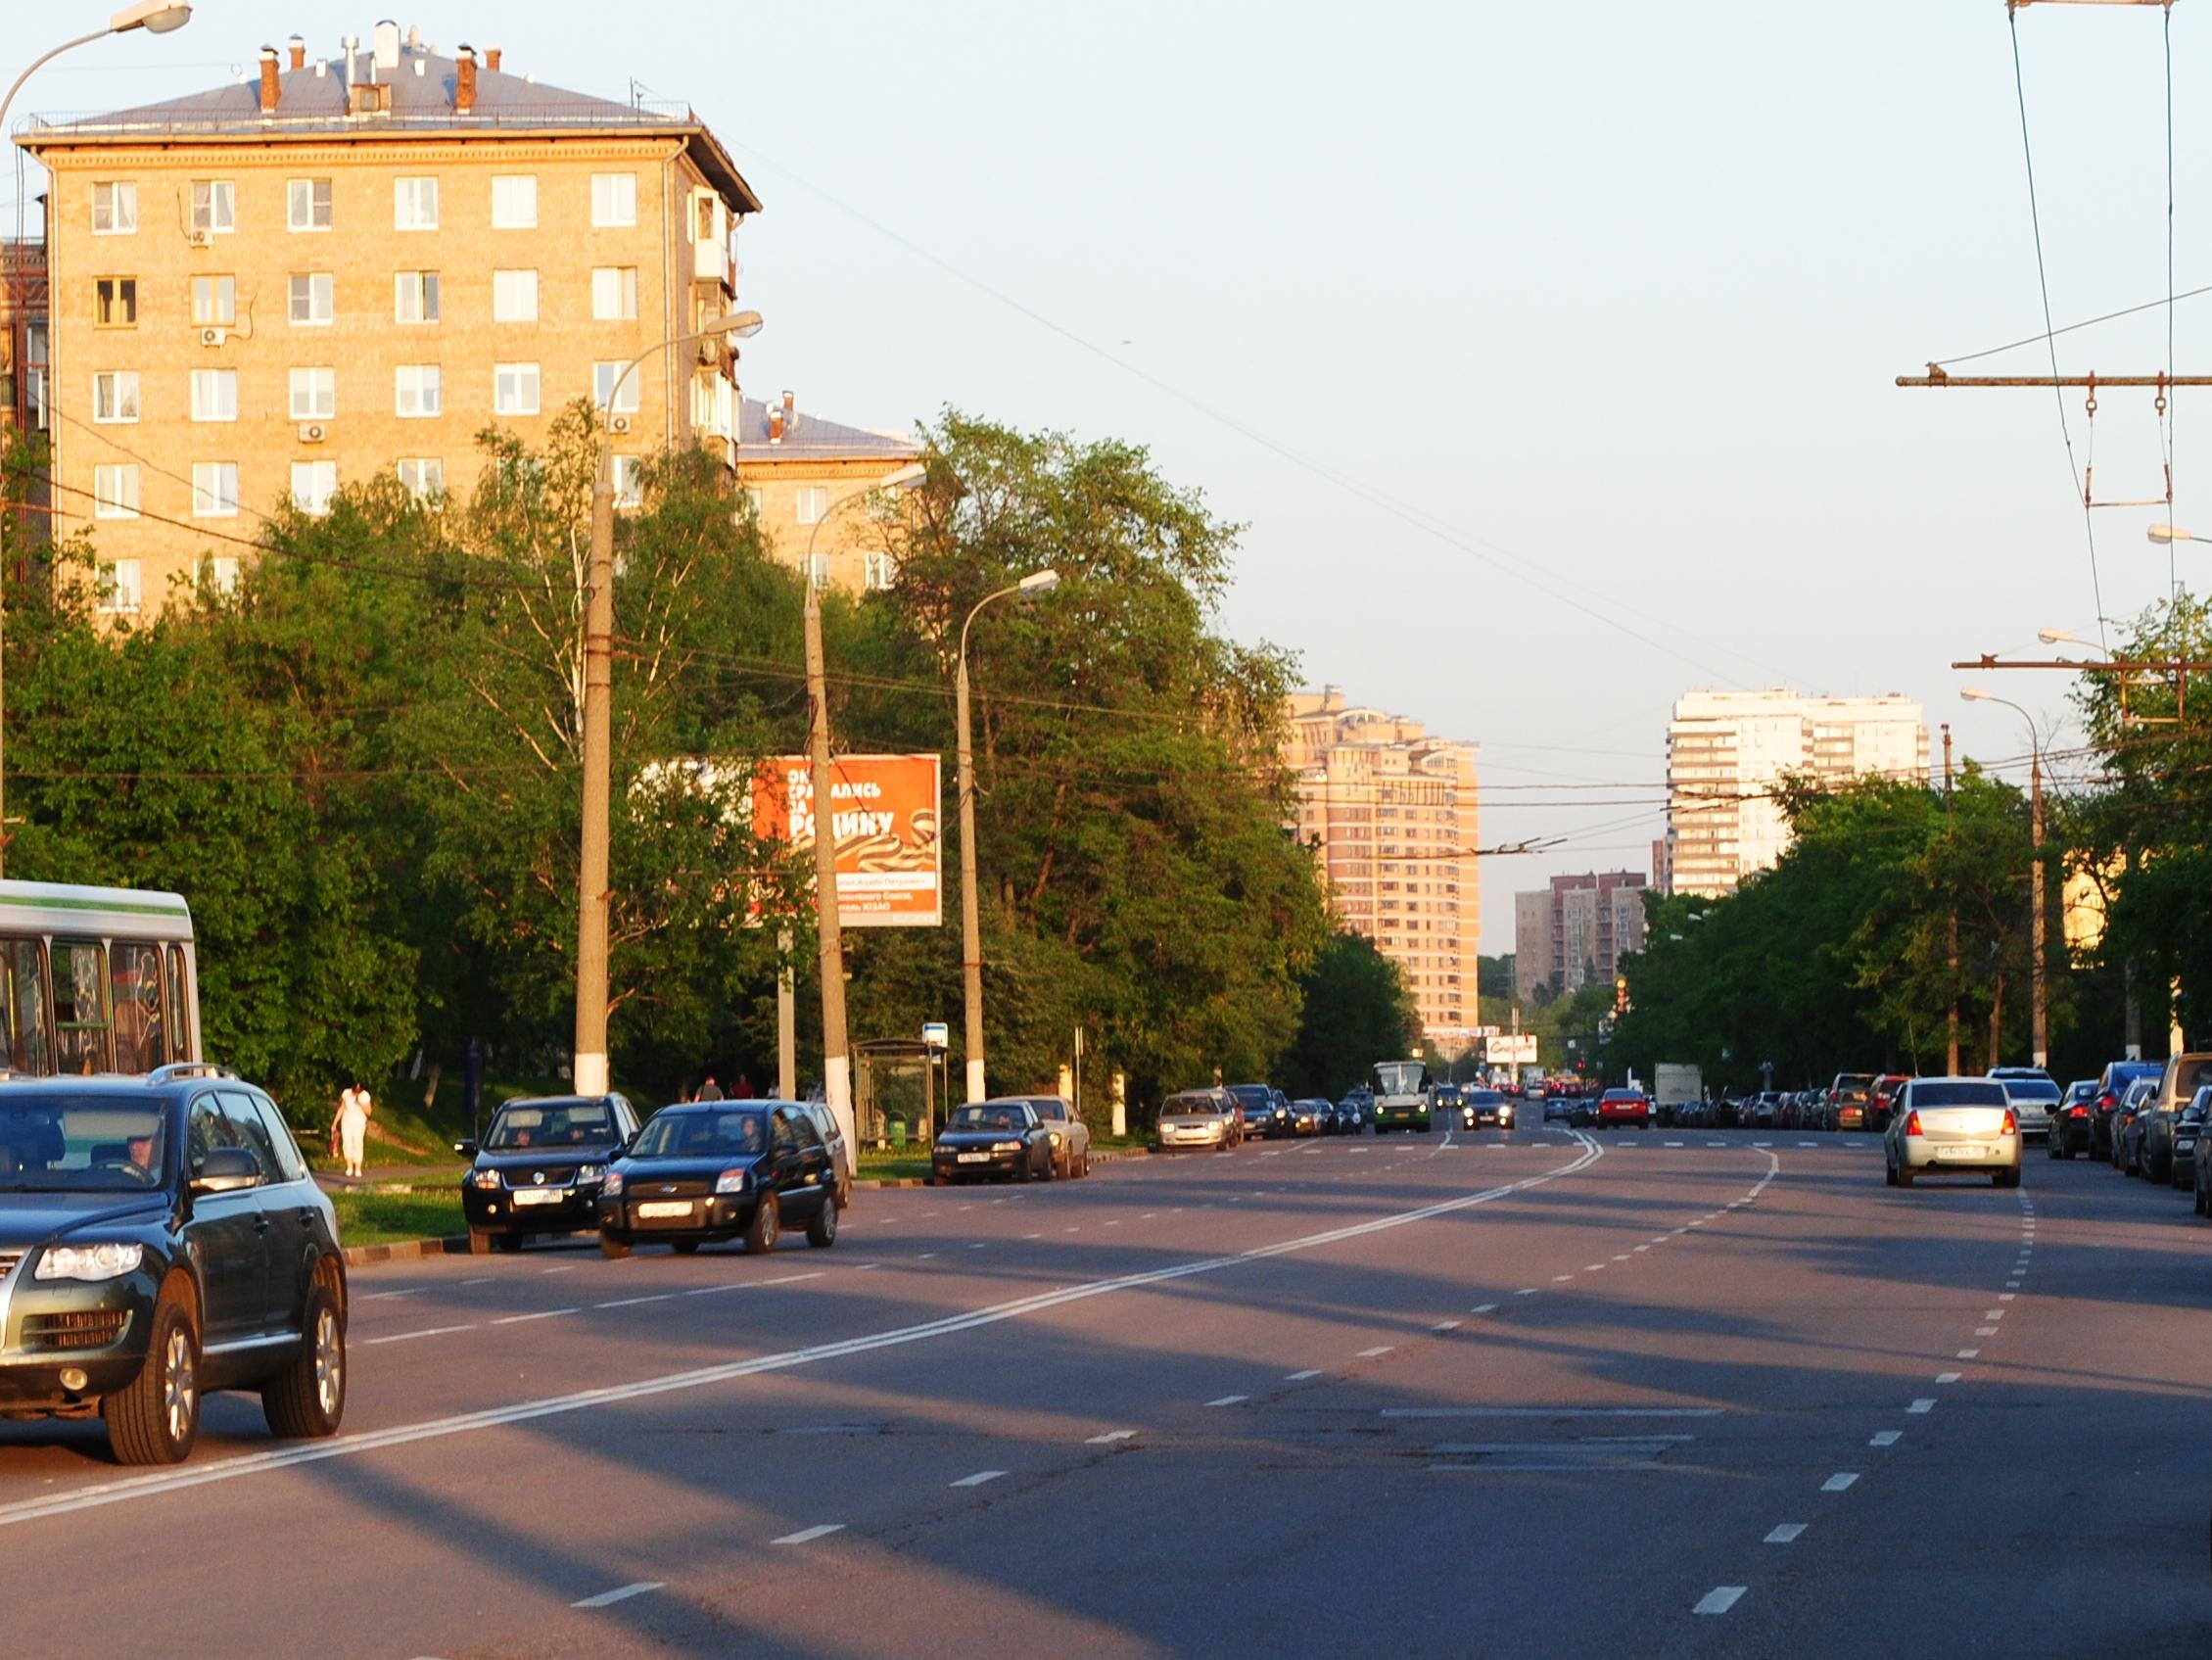 Улица Кравченко (вид от проспекта ...: dic.academic.ru/dic.nsf/ruwiki/1656914